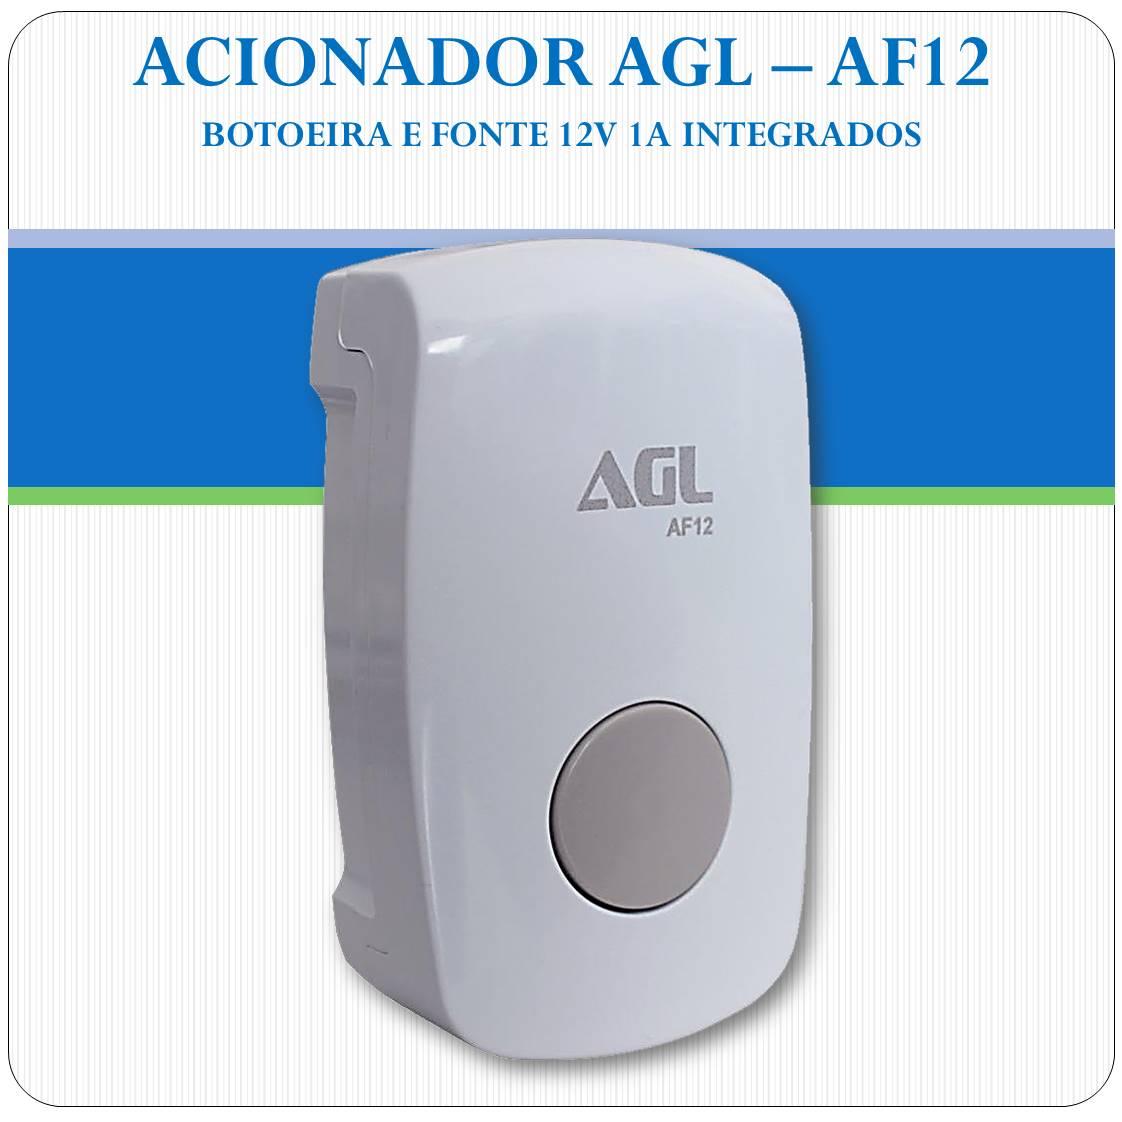 Botoeira Agl Af12 - Para Fechaduras Elétricas